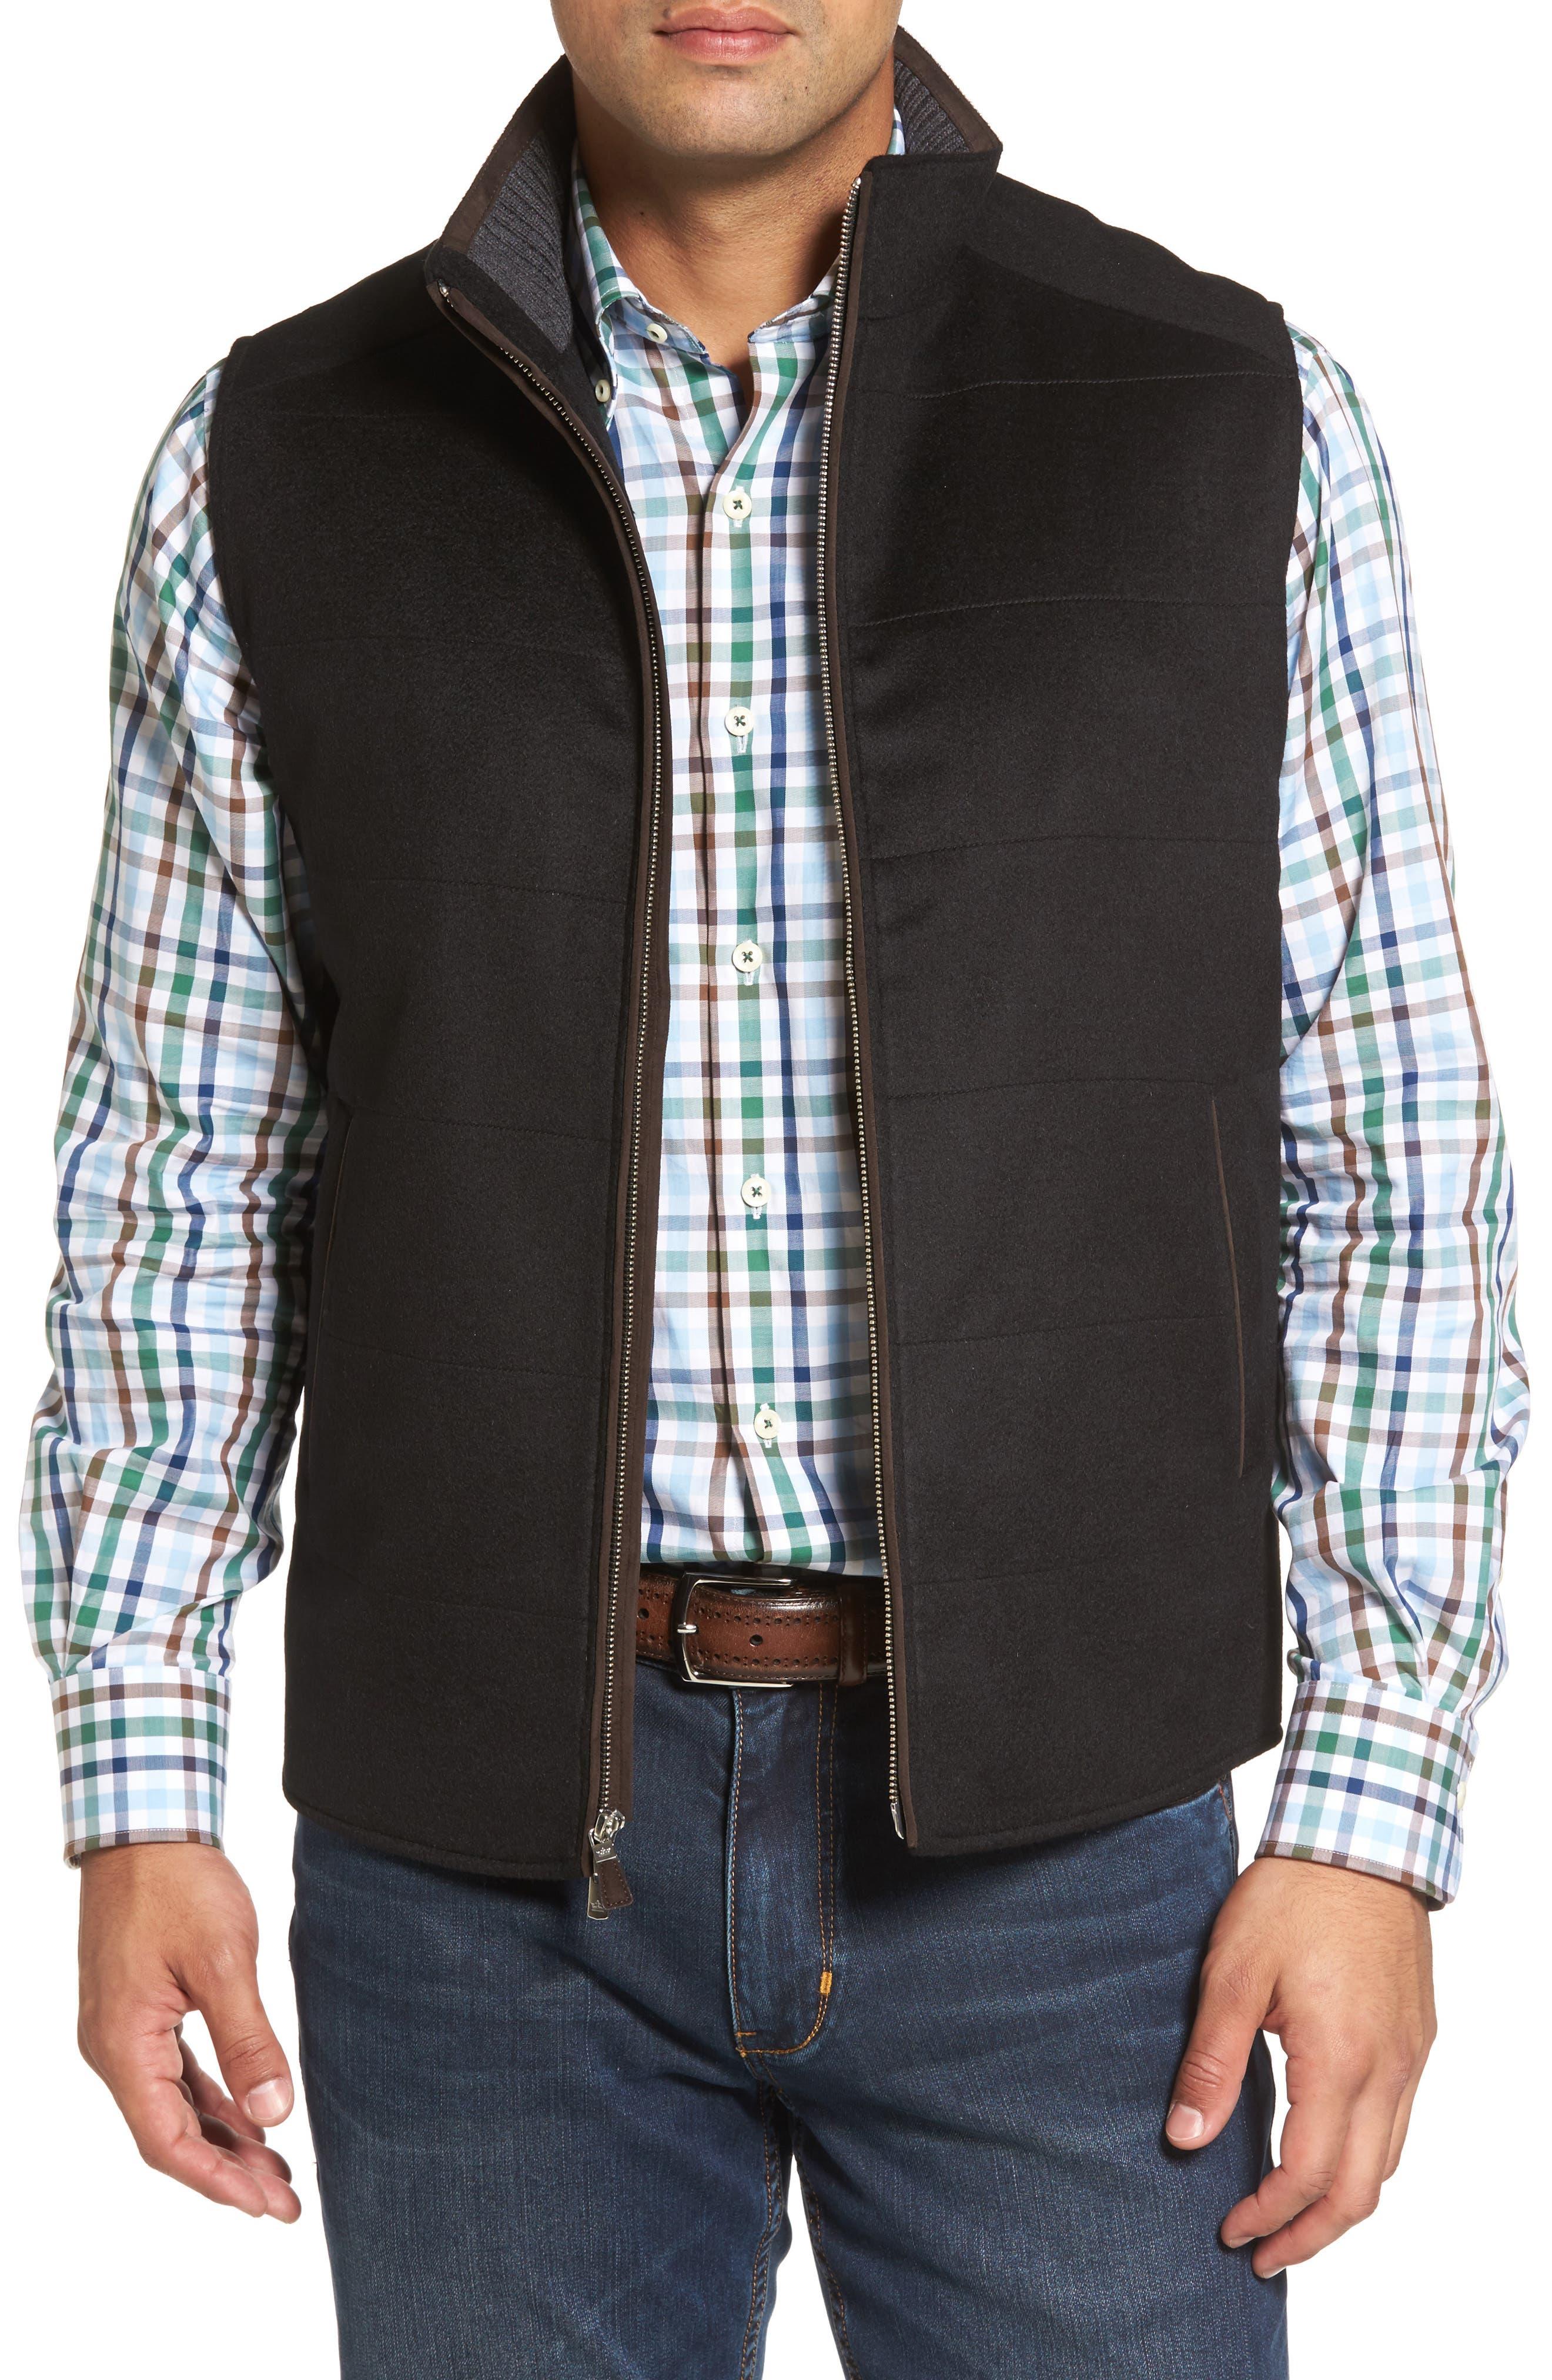 Main Image - Peter Millar Crown Darien Wool & Cashmere Vest